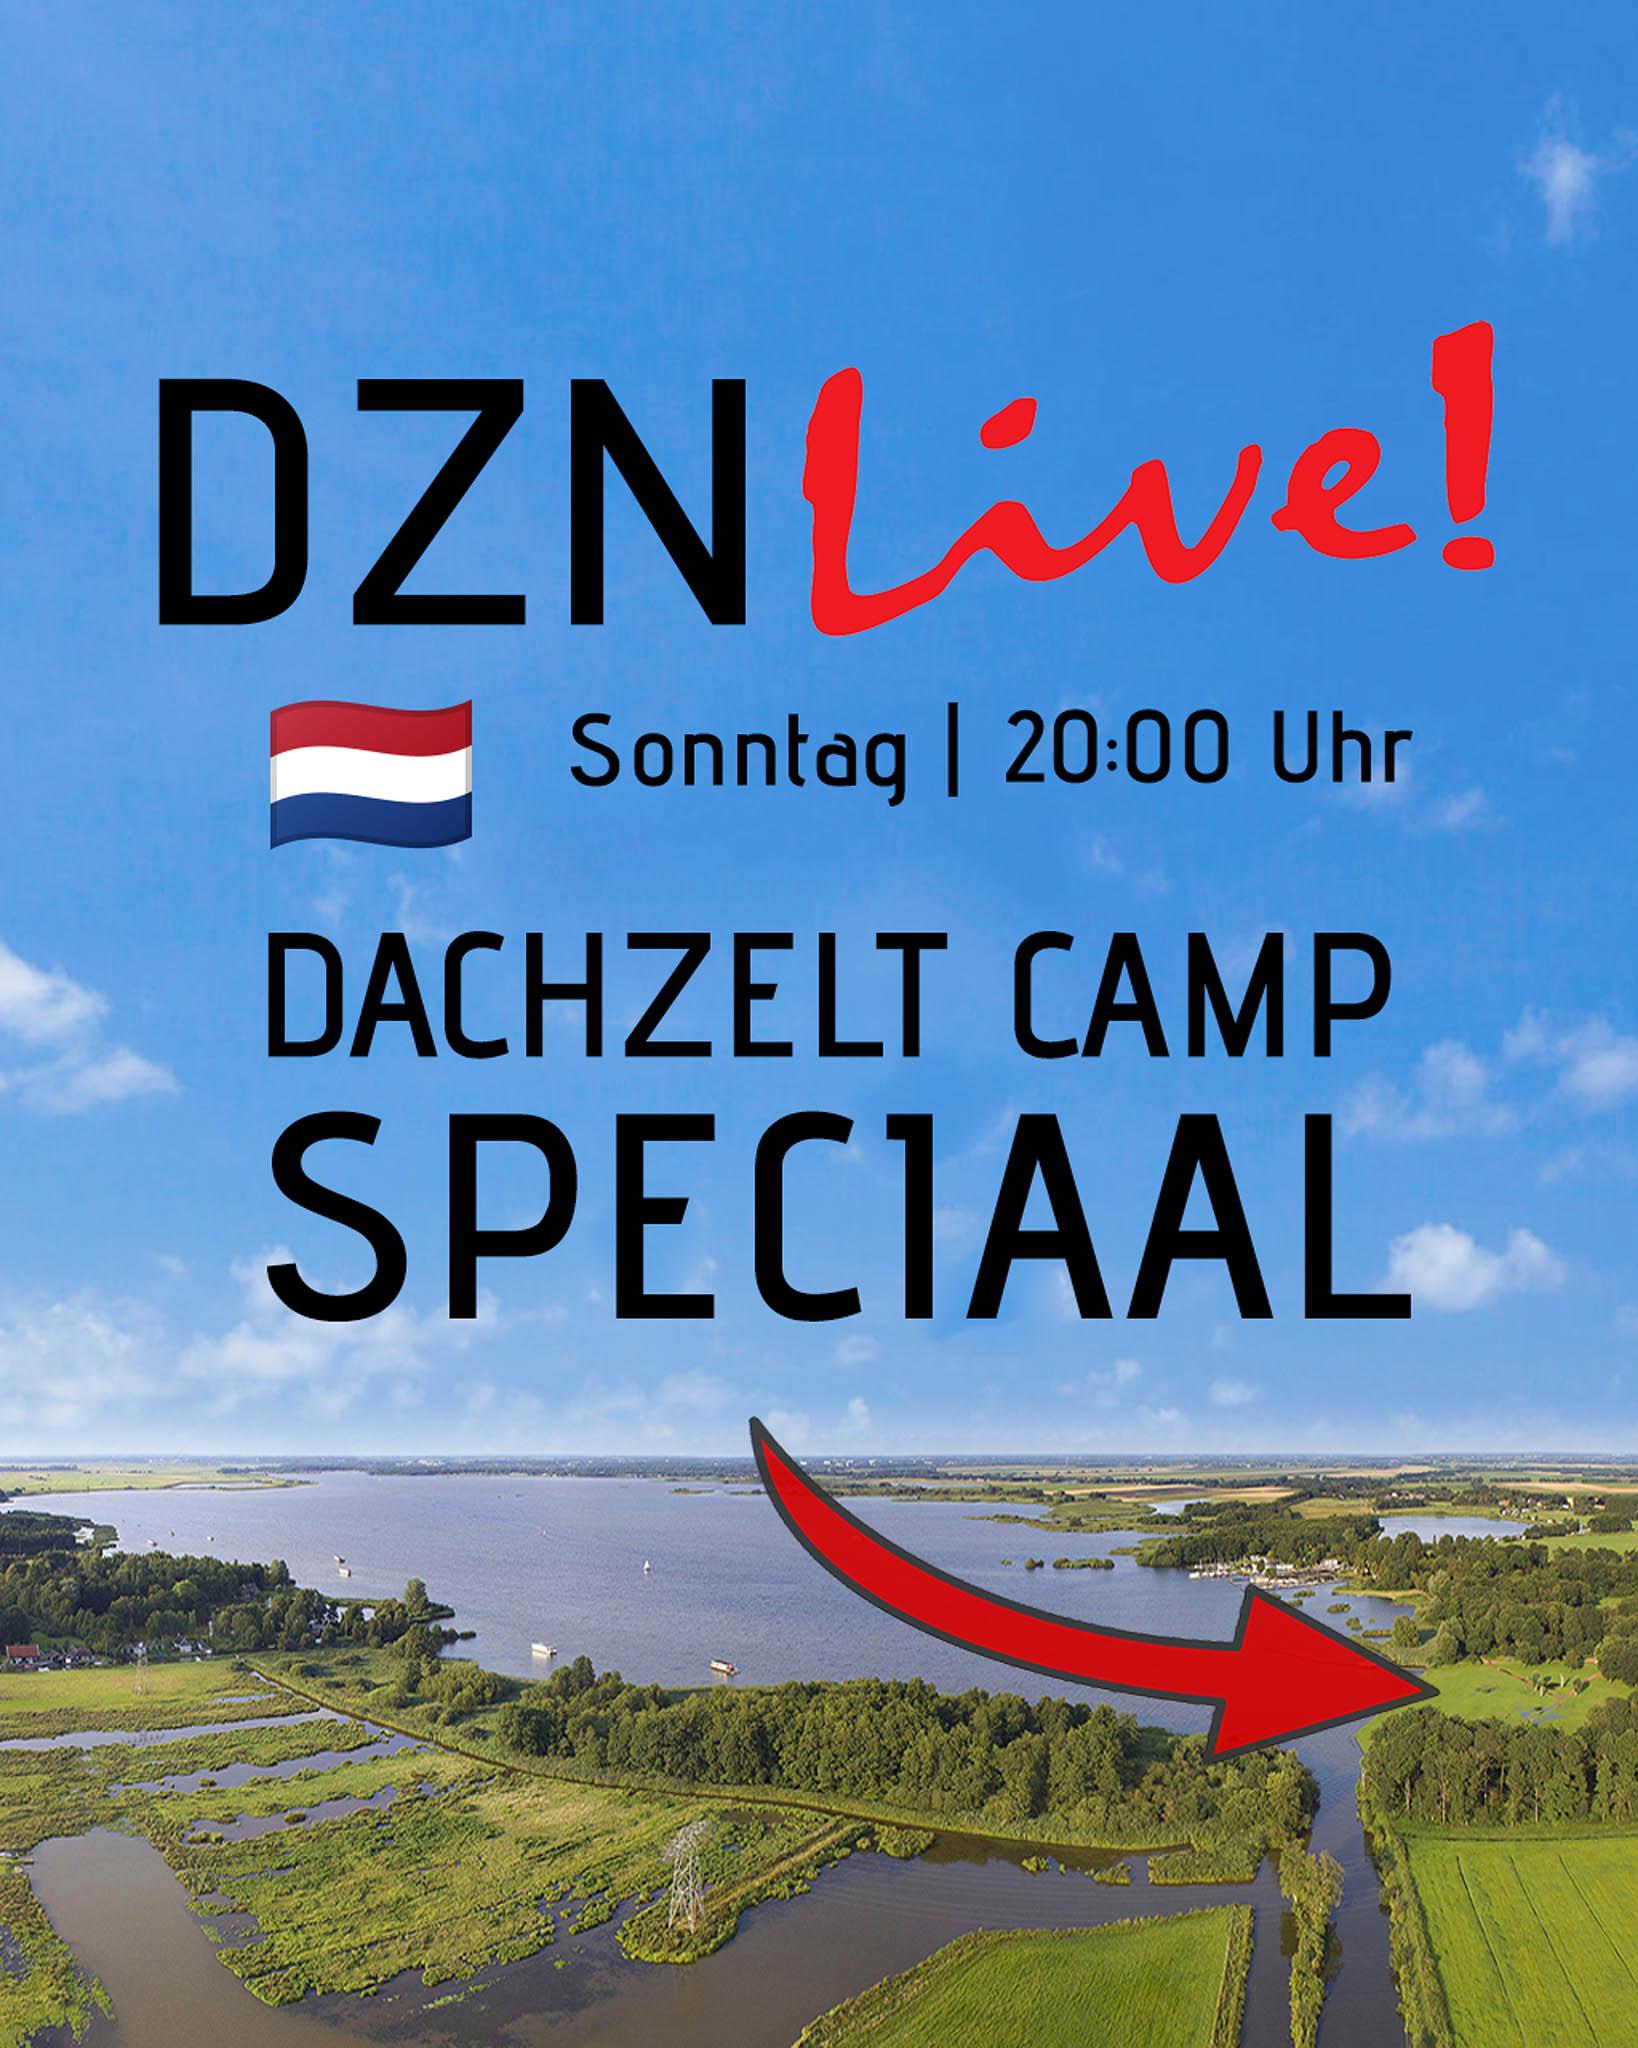 dzn-live-dachzelt-camp-speciaal-zuidlaardermeer-4-5.jpg